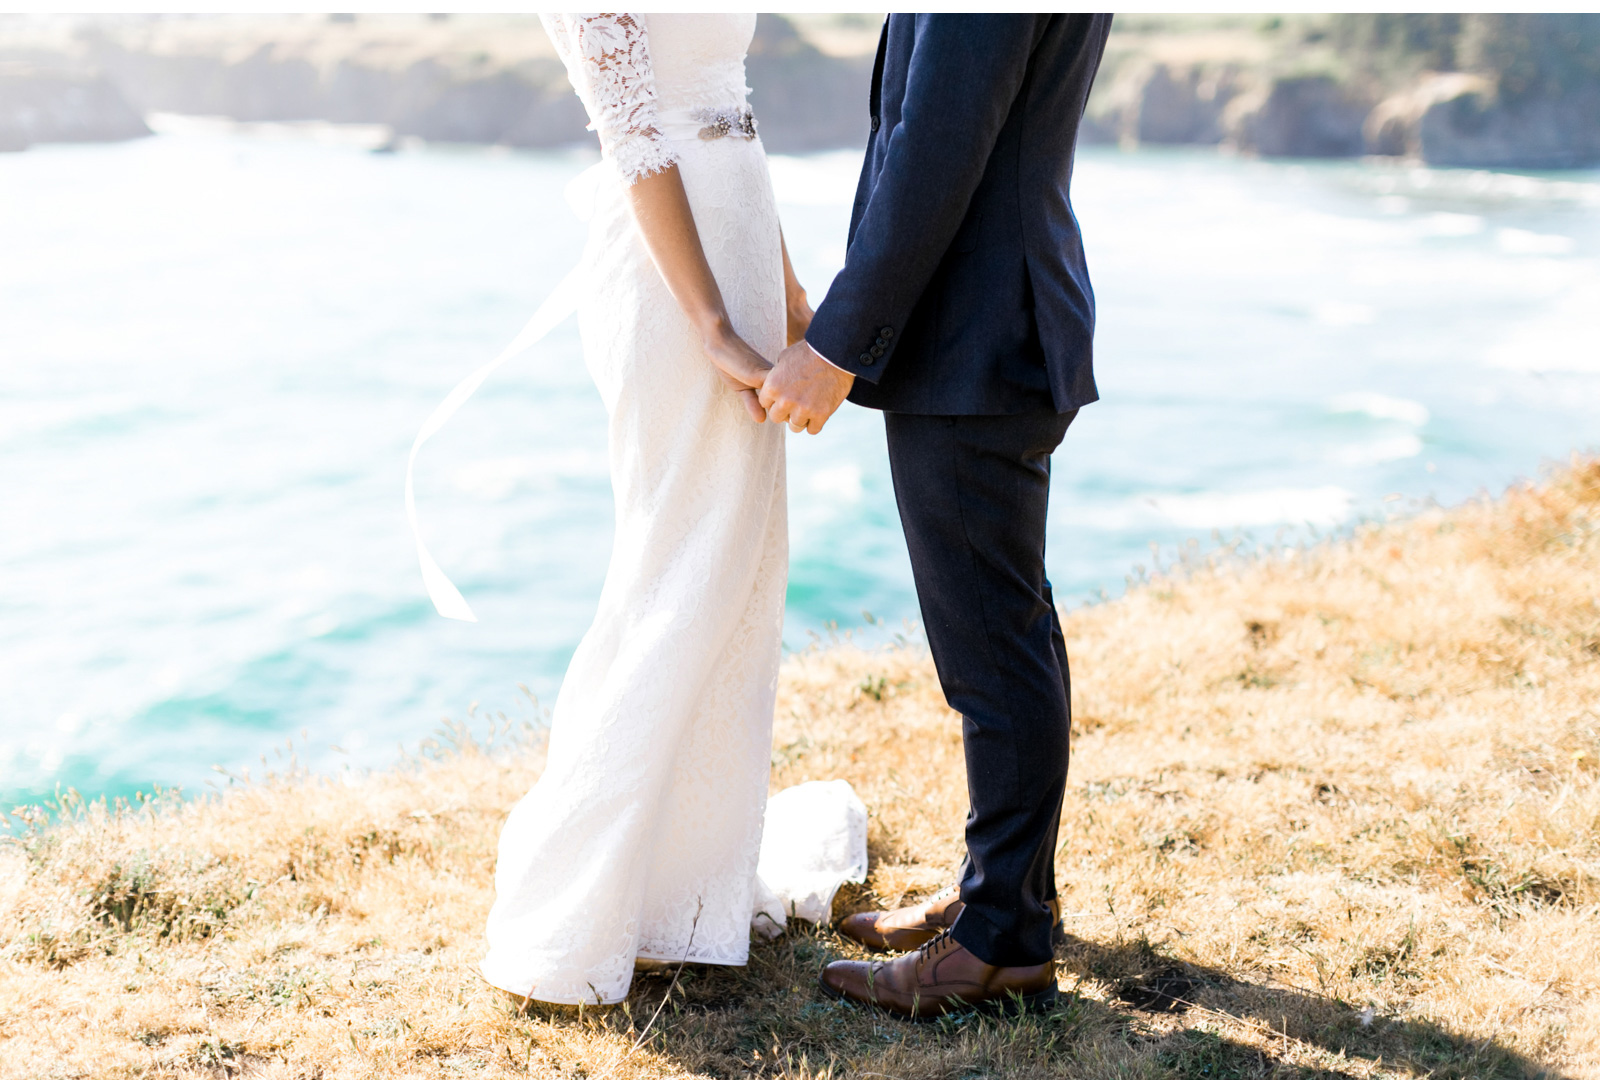 Style-Me-Pretty-Mendocino-Wedding-Natalie-Schutt-Photography_02.jpg